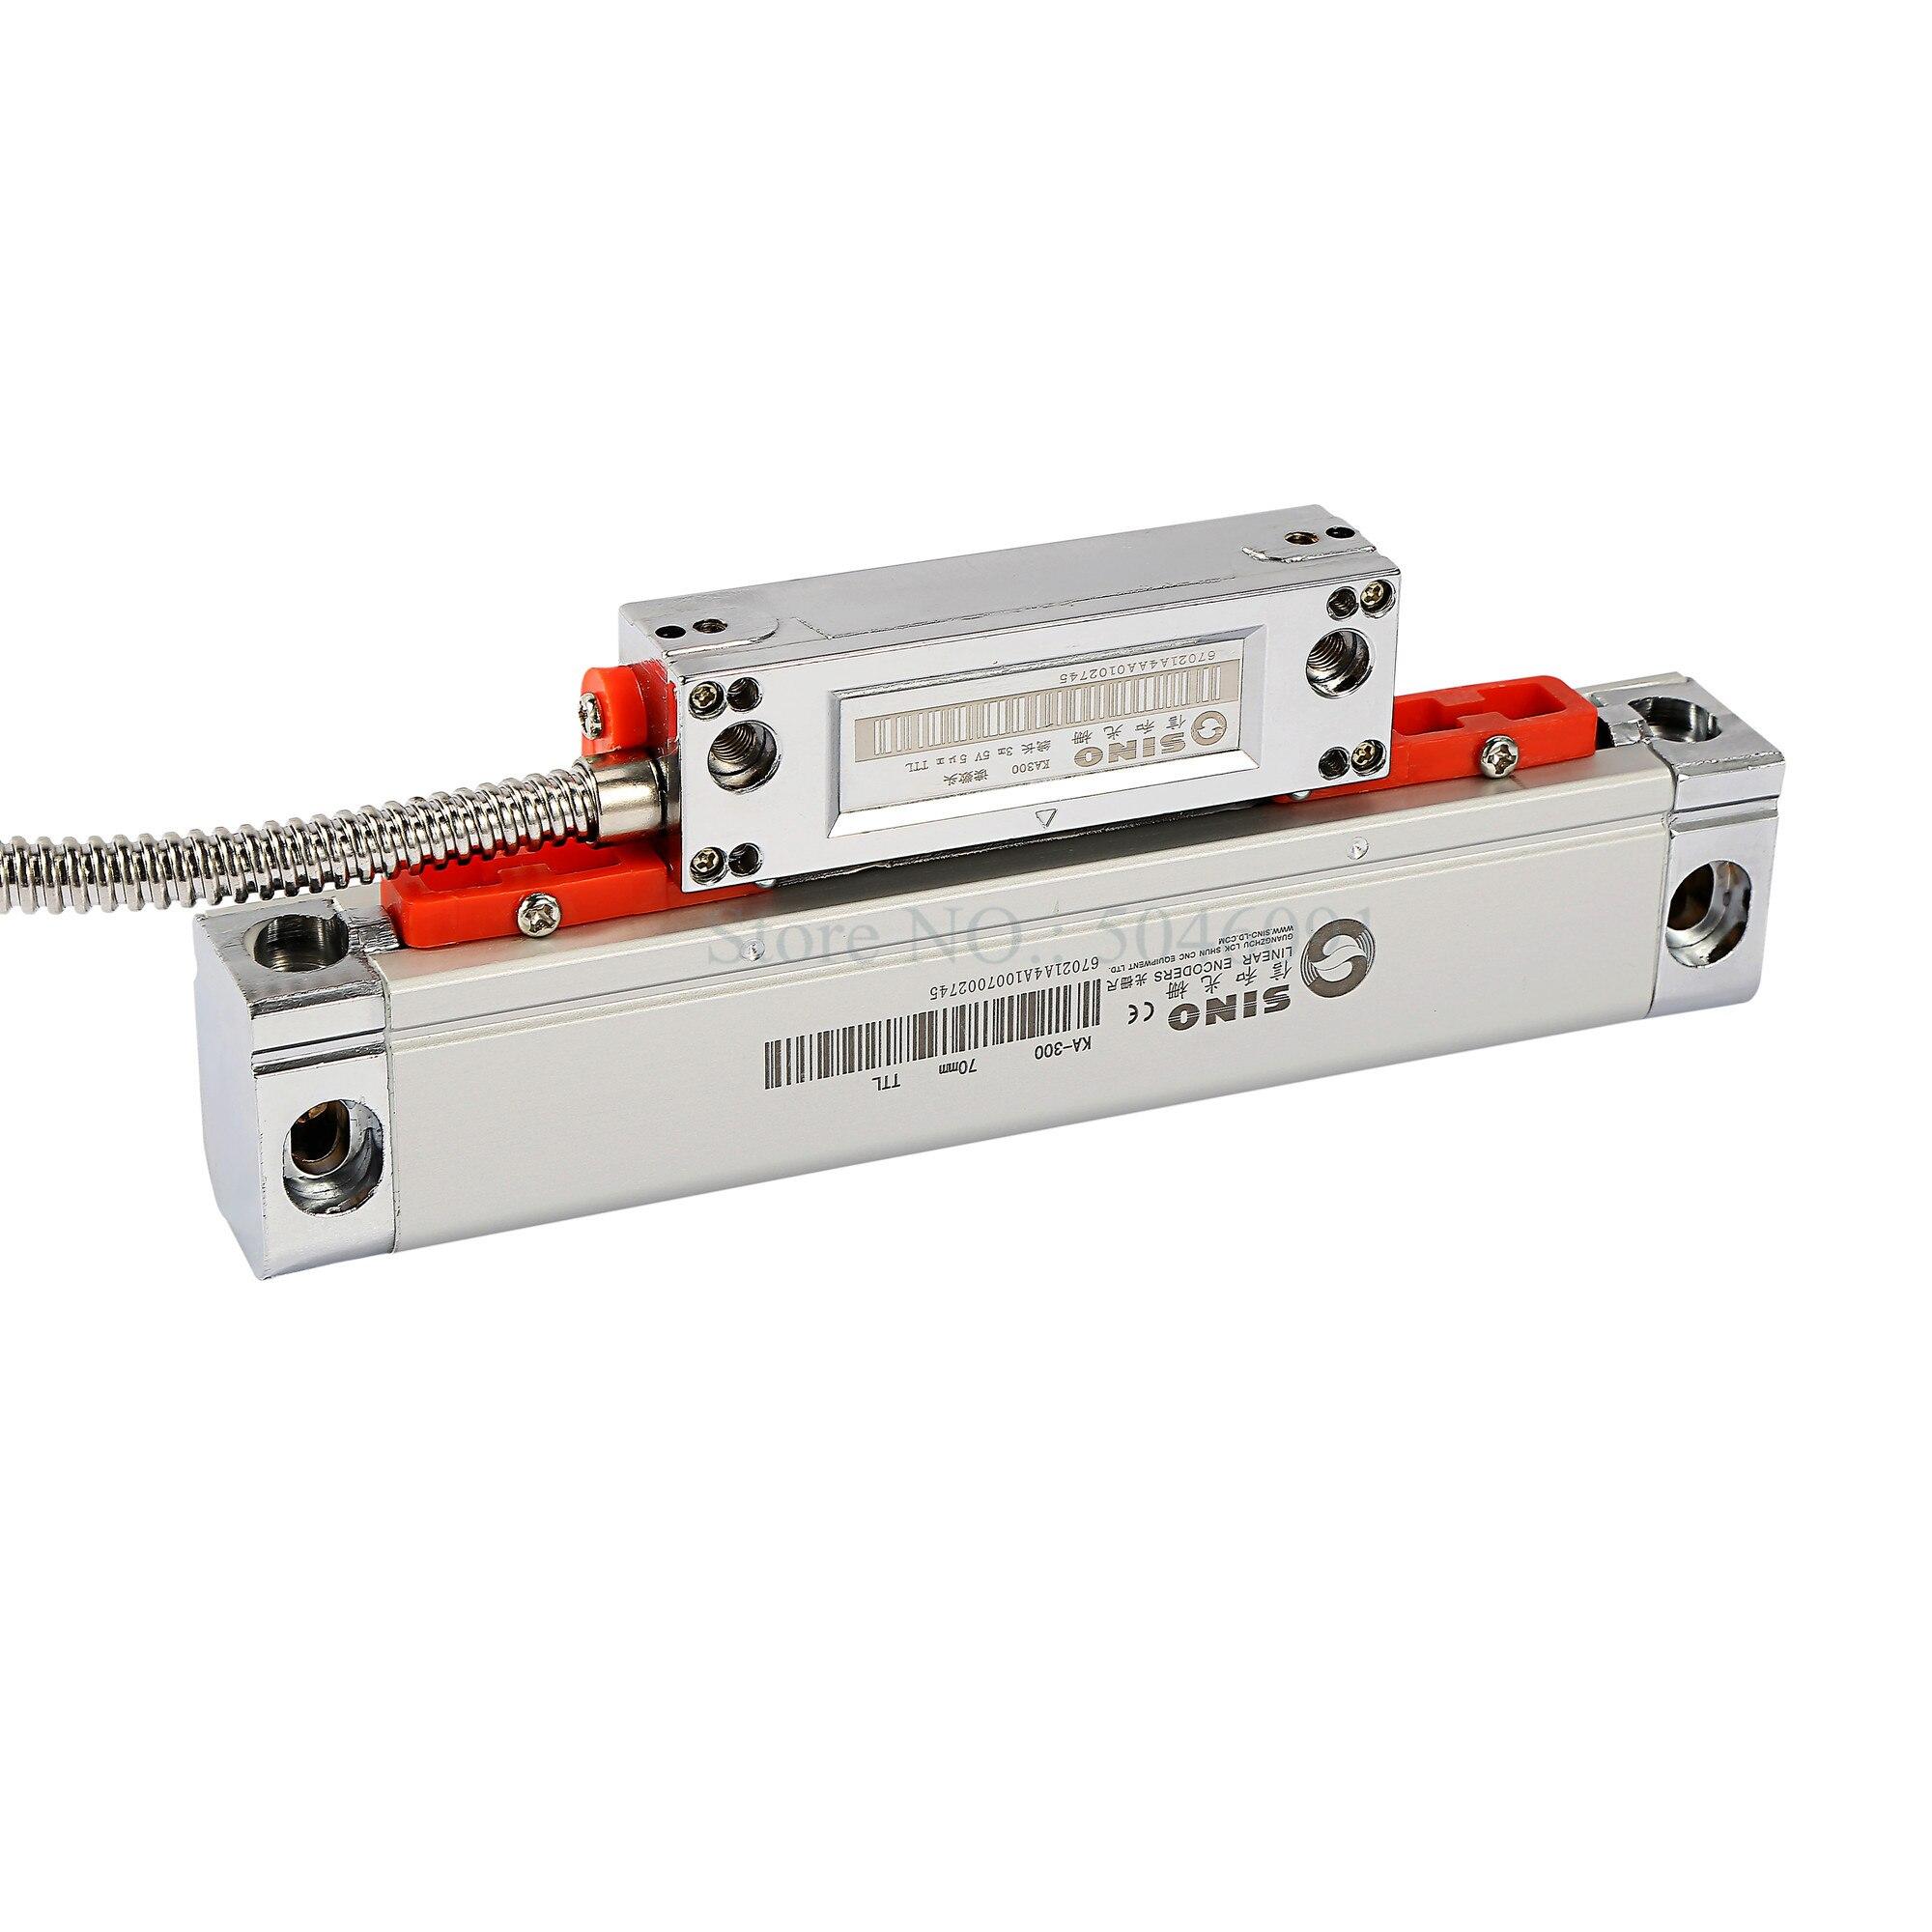 SINO KA-300 Optical Enencoder KA300 5um TTL 5V 70 120 170 220 270 320 370 420 470mm Linear Glass Scale For Milling Lathe Machine